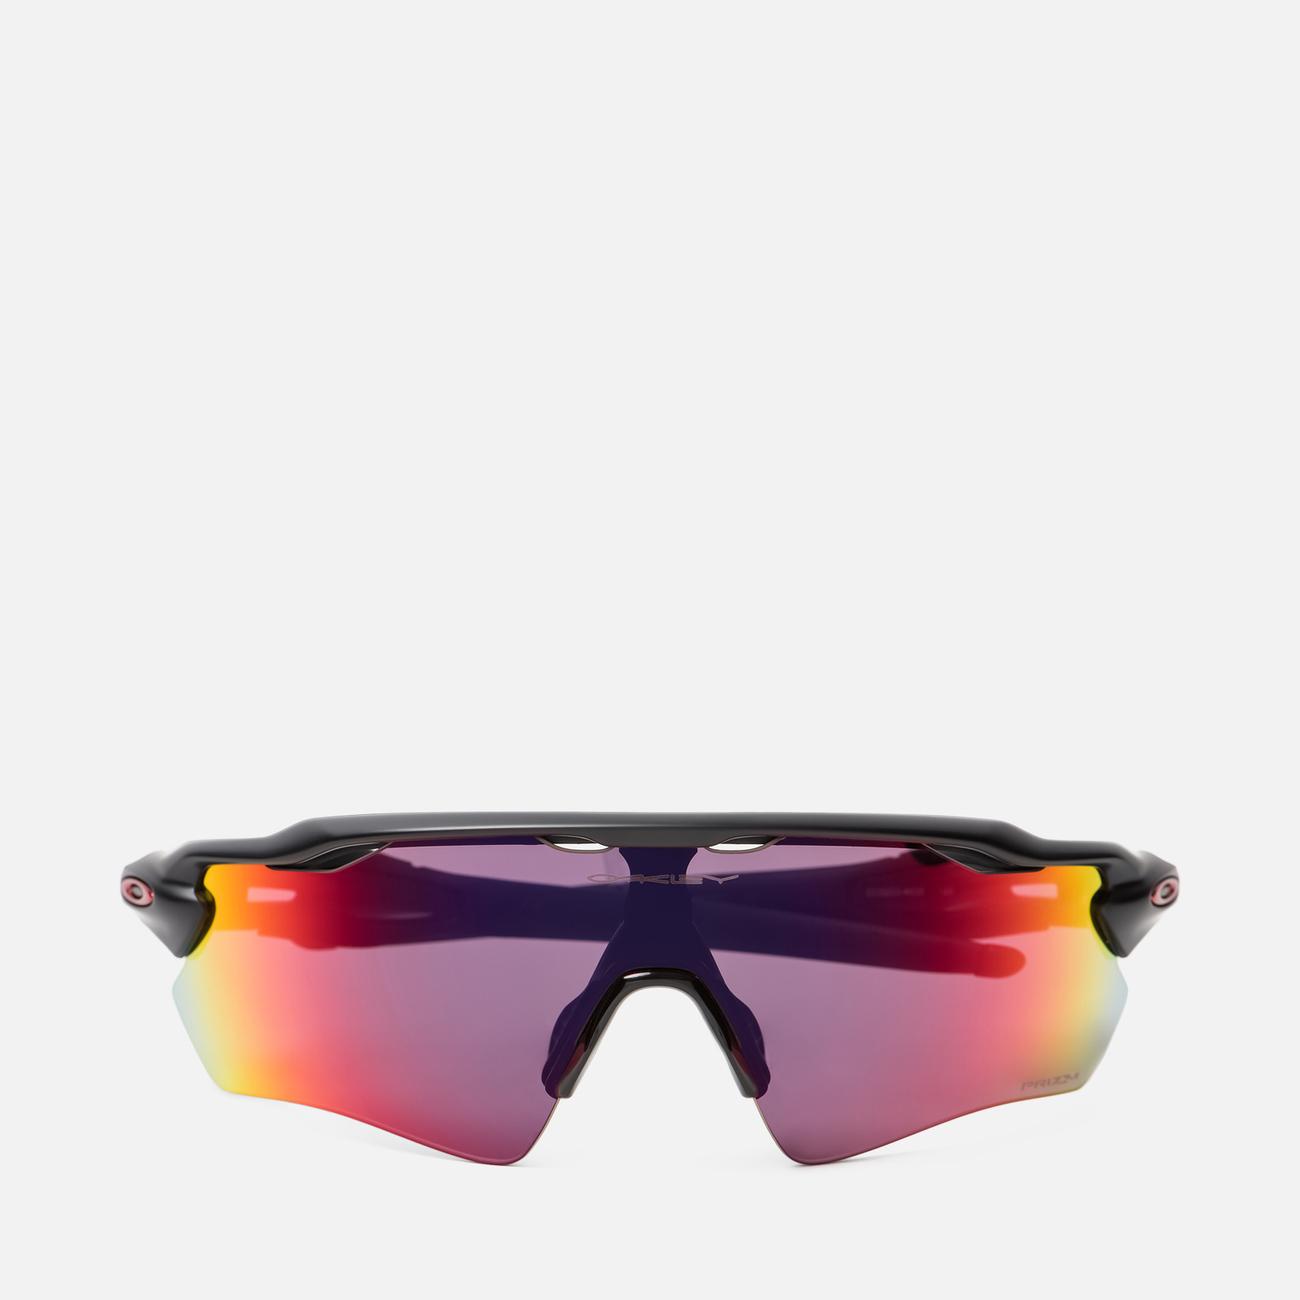 Солнцезащитные очки Oakley Radar EV Path Matte Black/Prizm Road